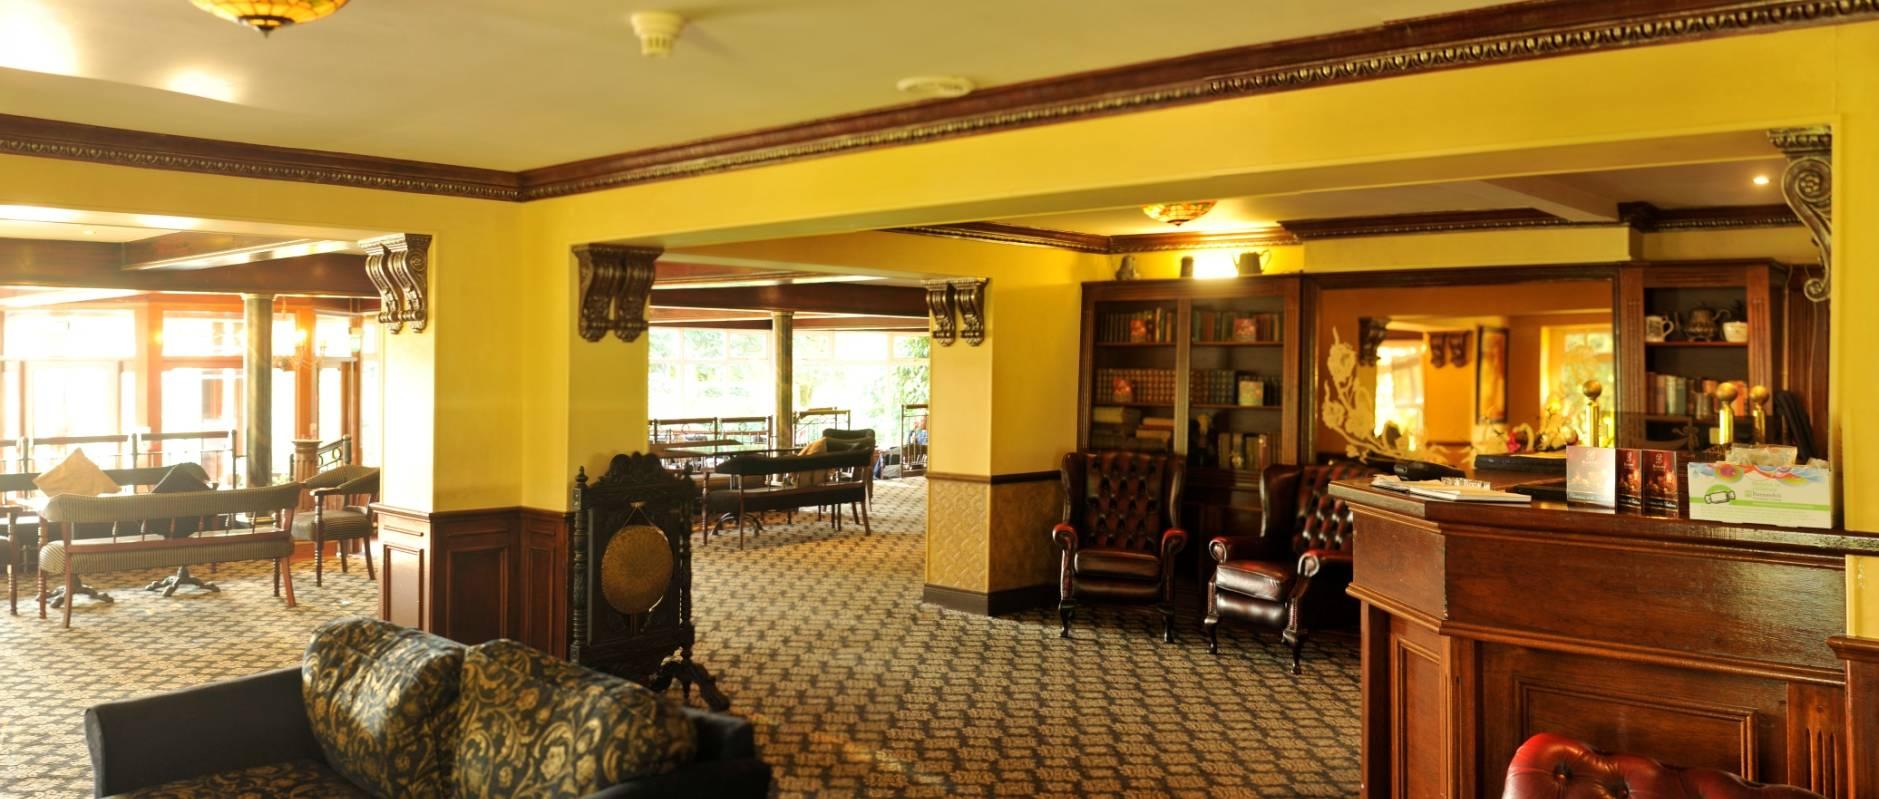 Foyer Bushtown Hotel Coleraine